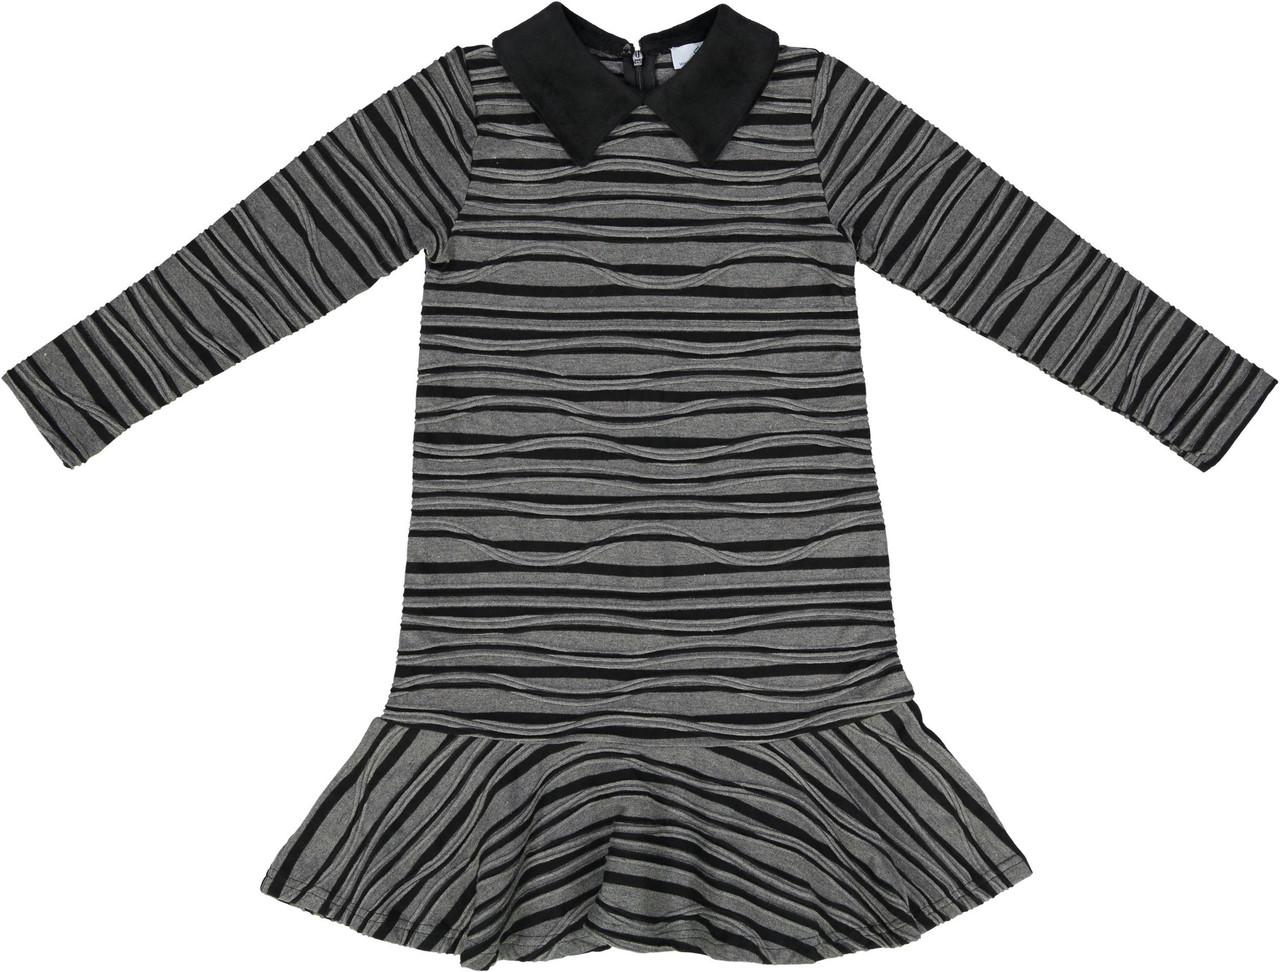 Whitlow & Hawkins Girls Zebra Stripe Dress - WHF191007